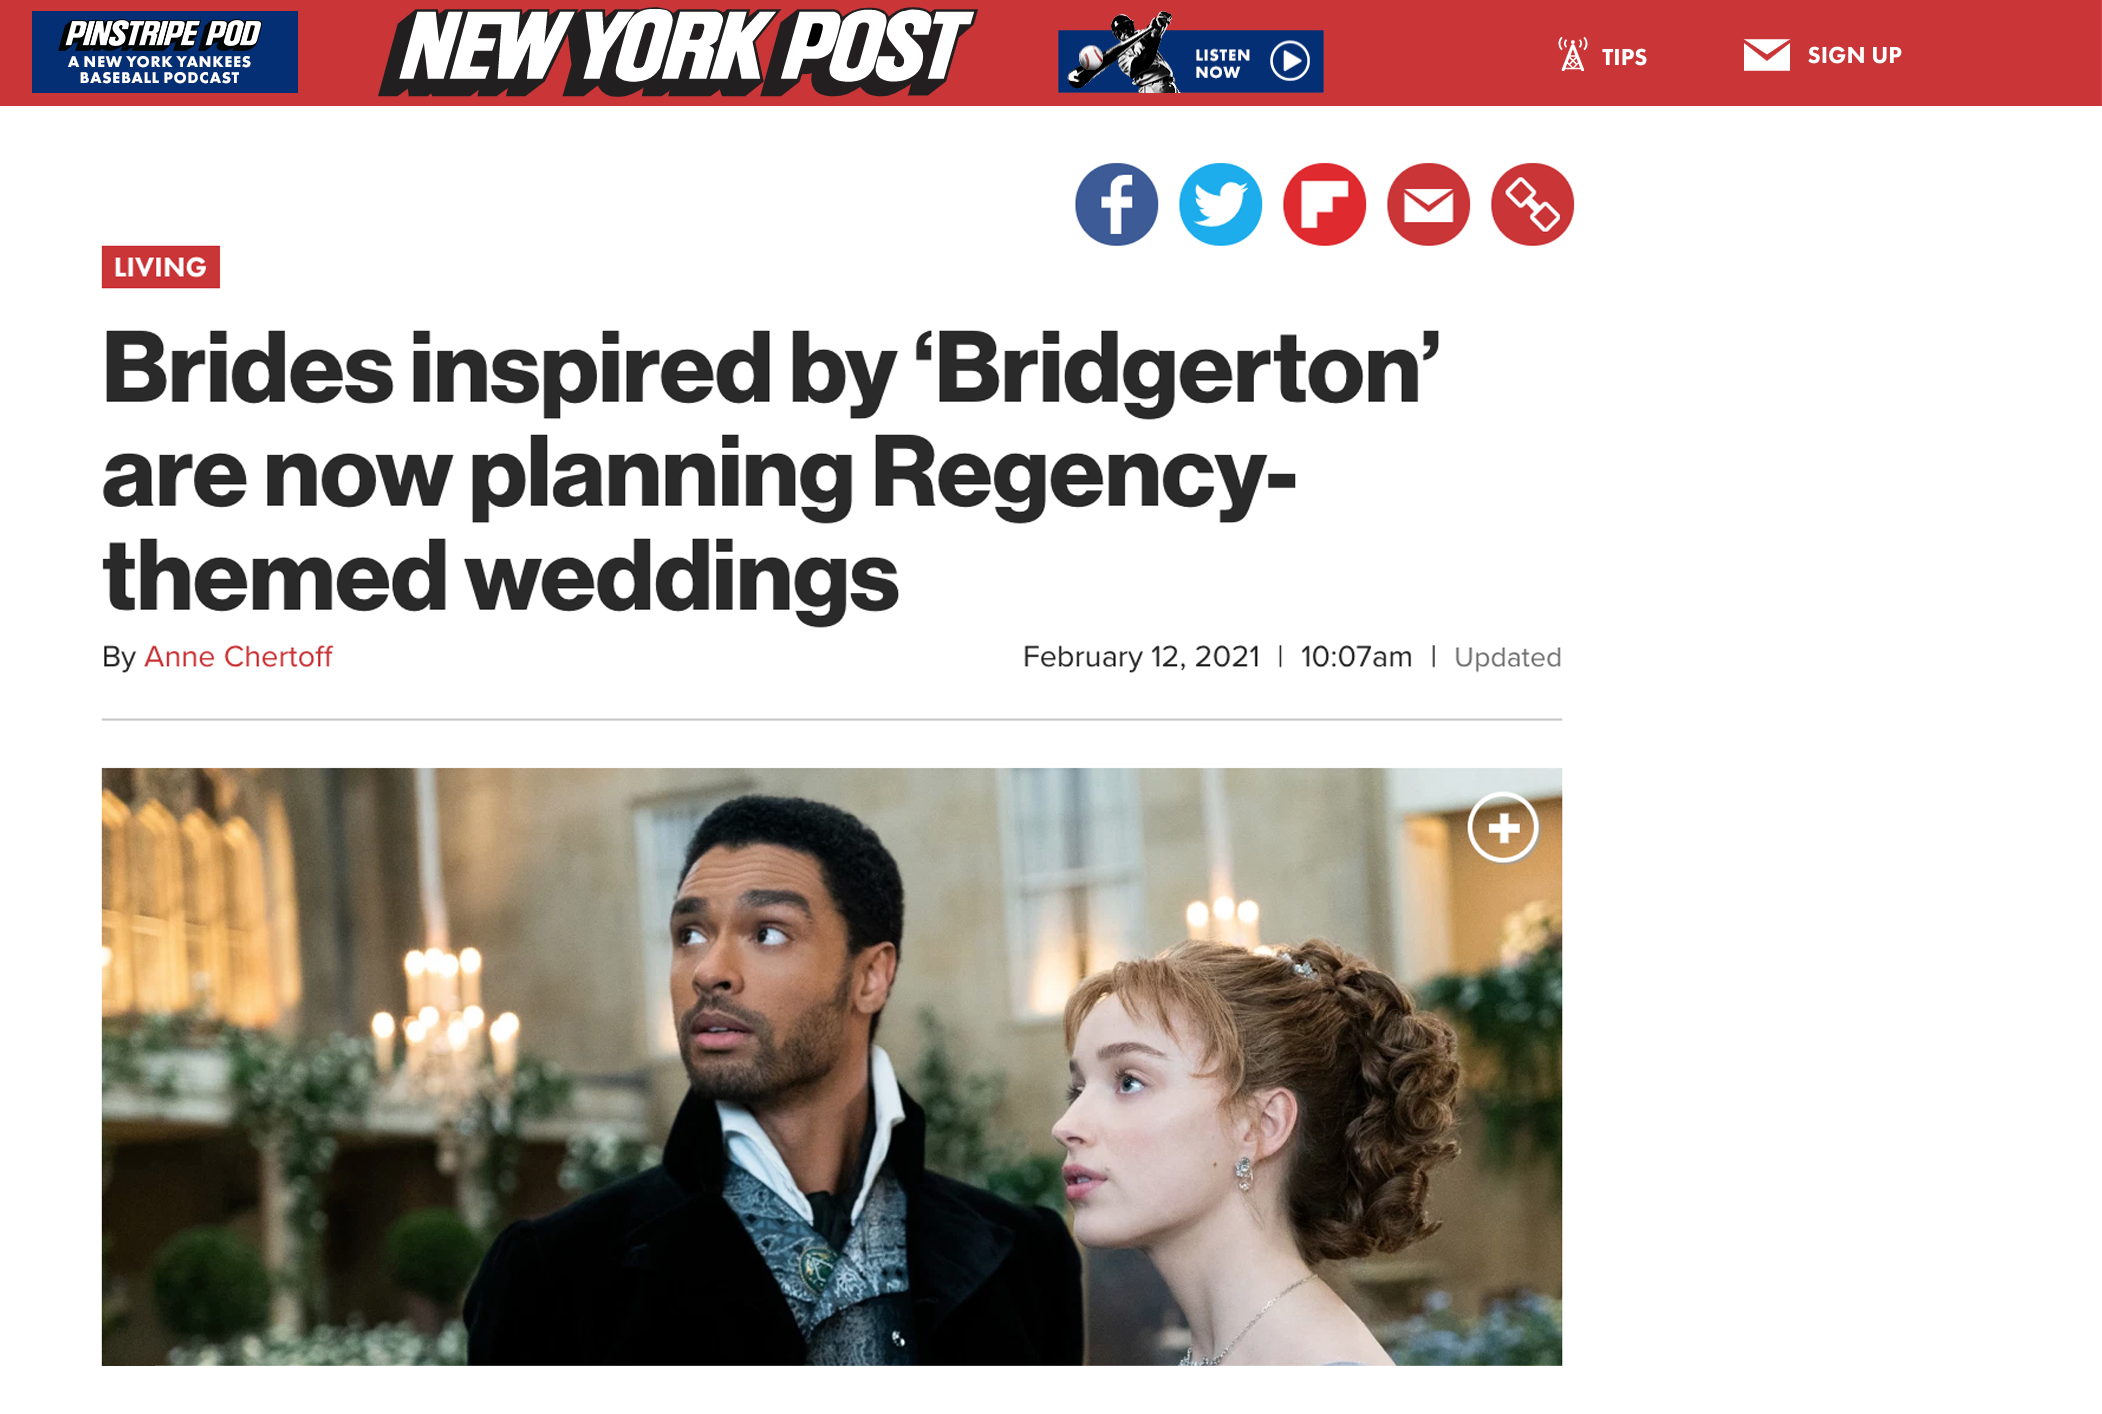 new-york-post-bridgerton-weddings